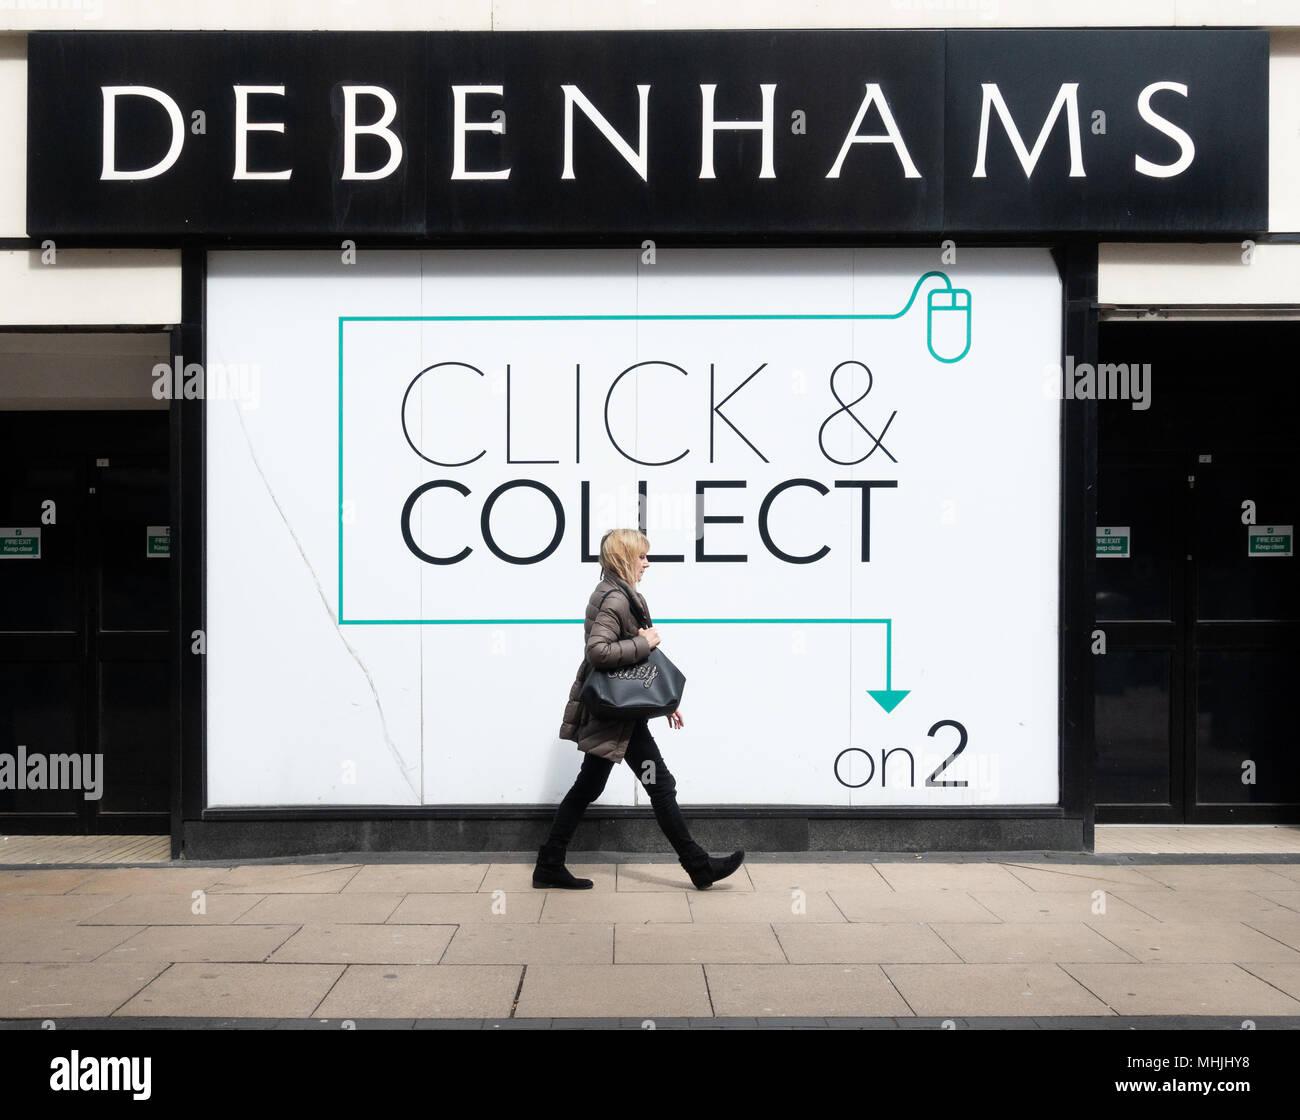 Debenhams click and collect. UK - Stock Image